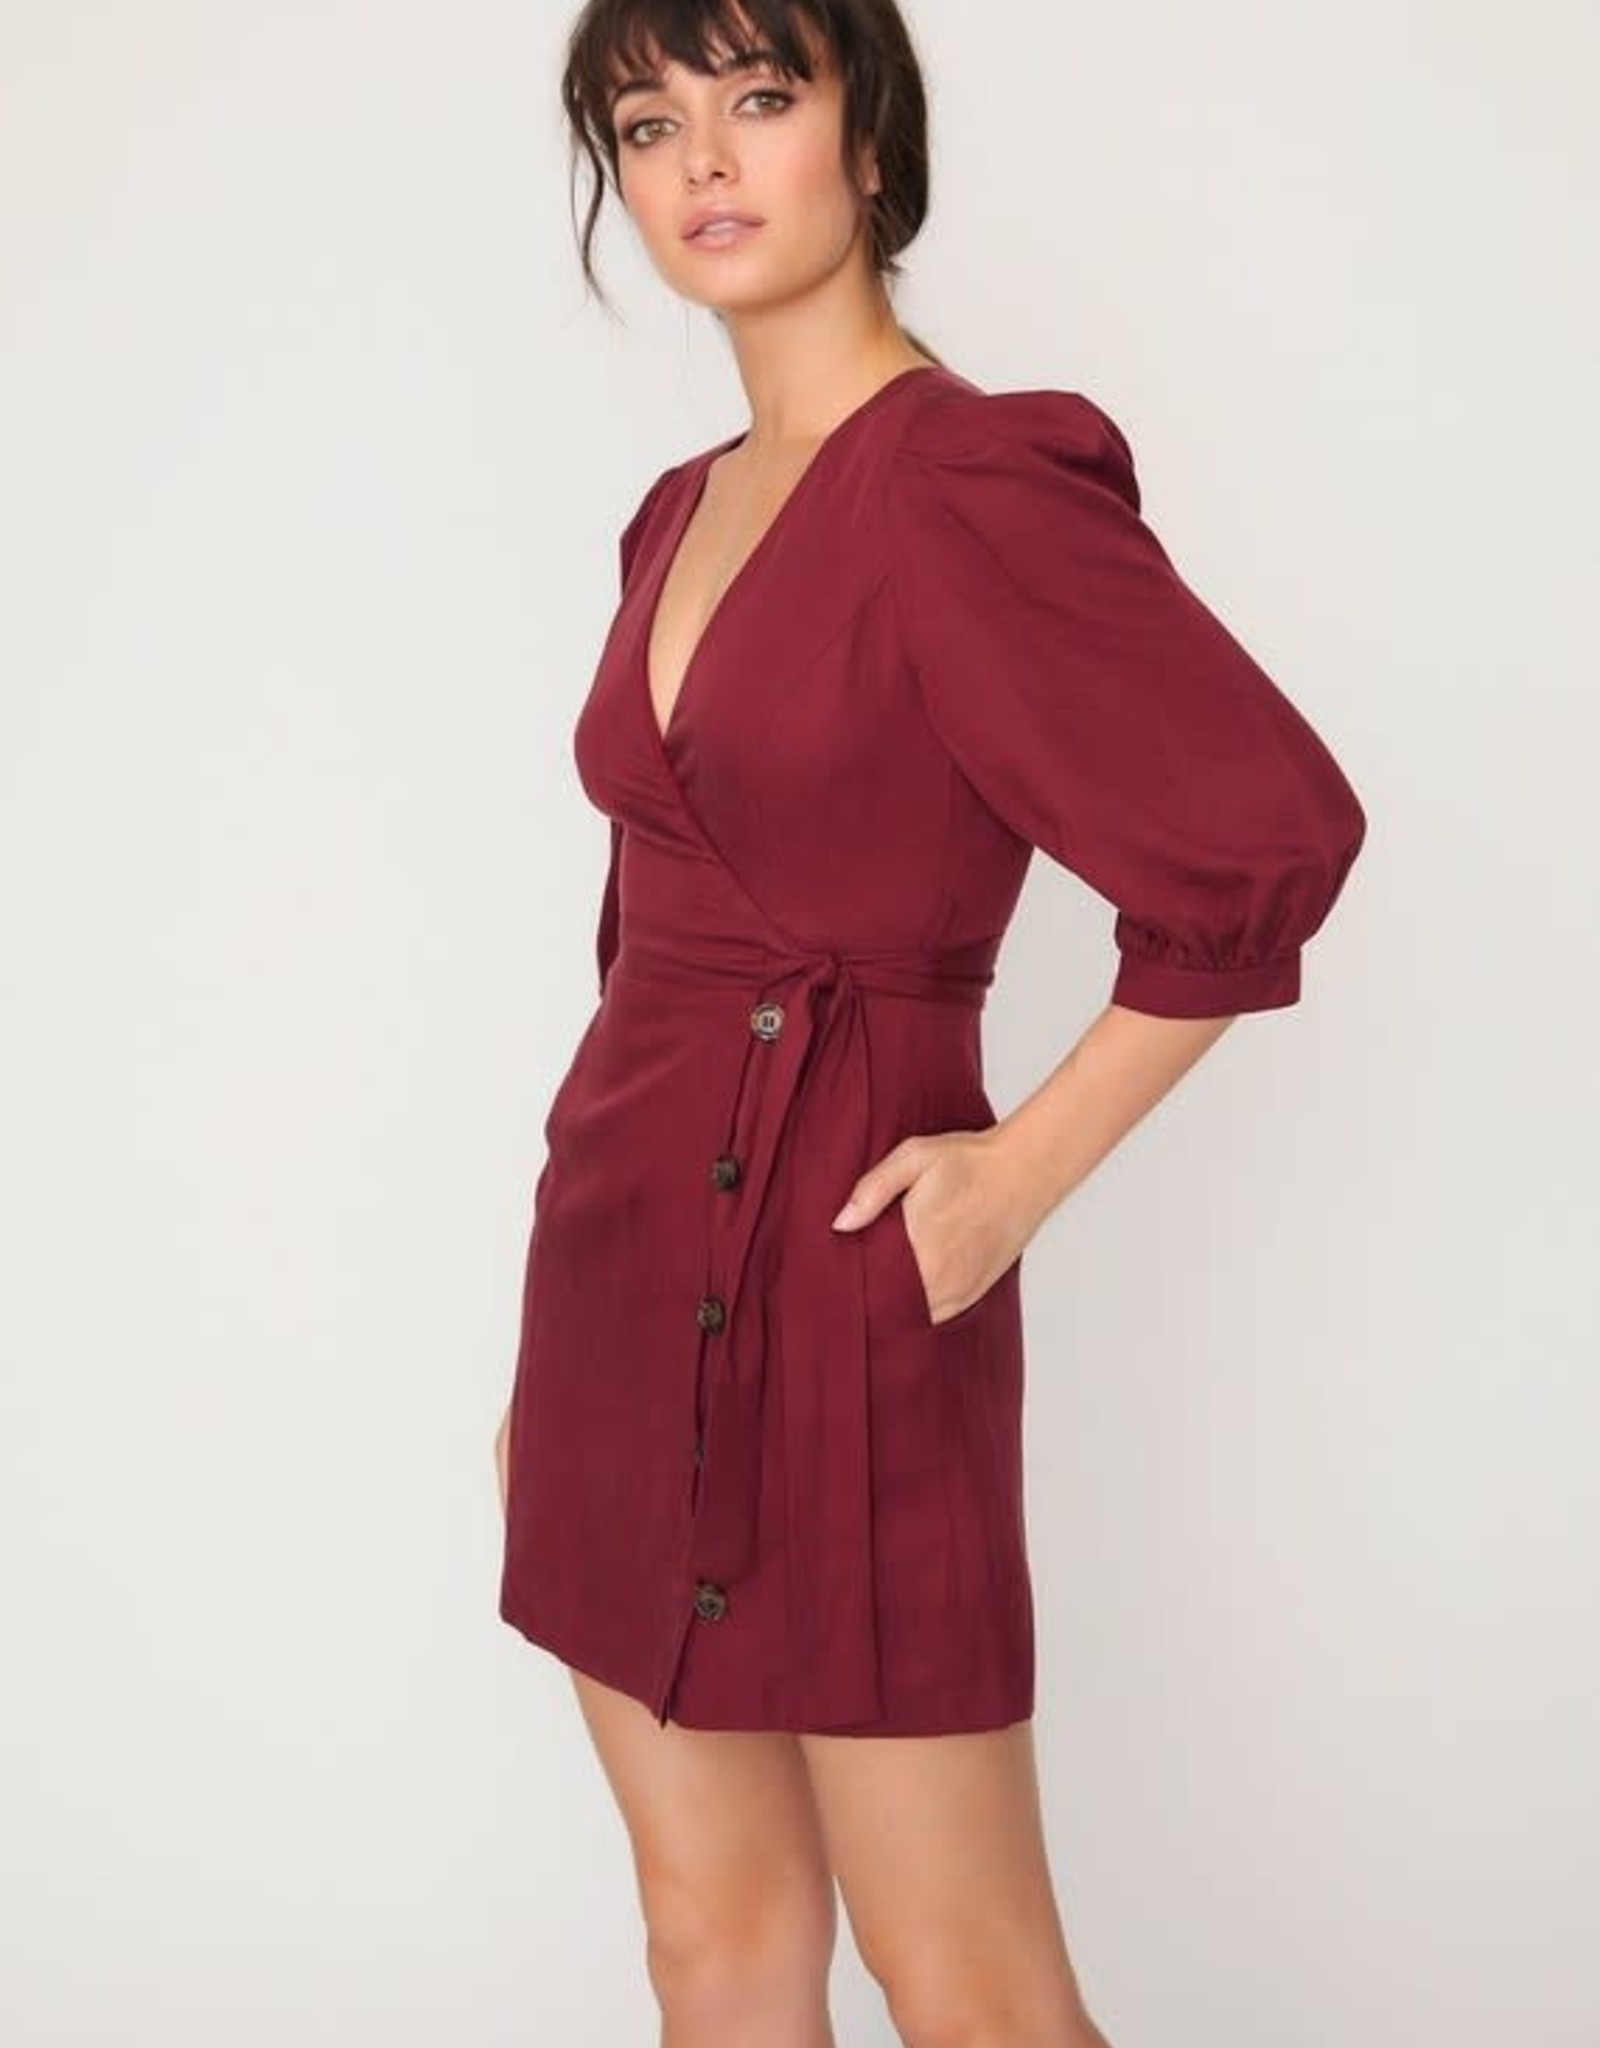 Lost & Wander Wrap Mini Dress w/Puffed Sleeves